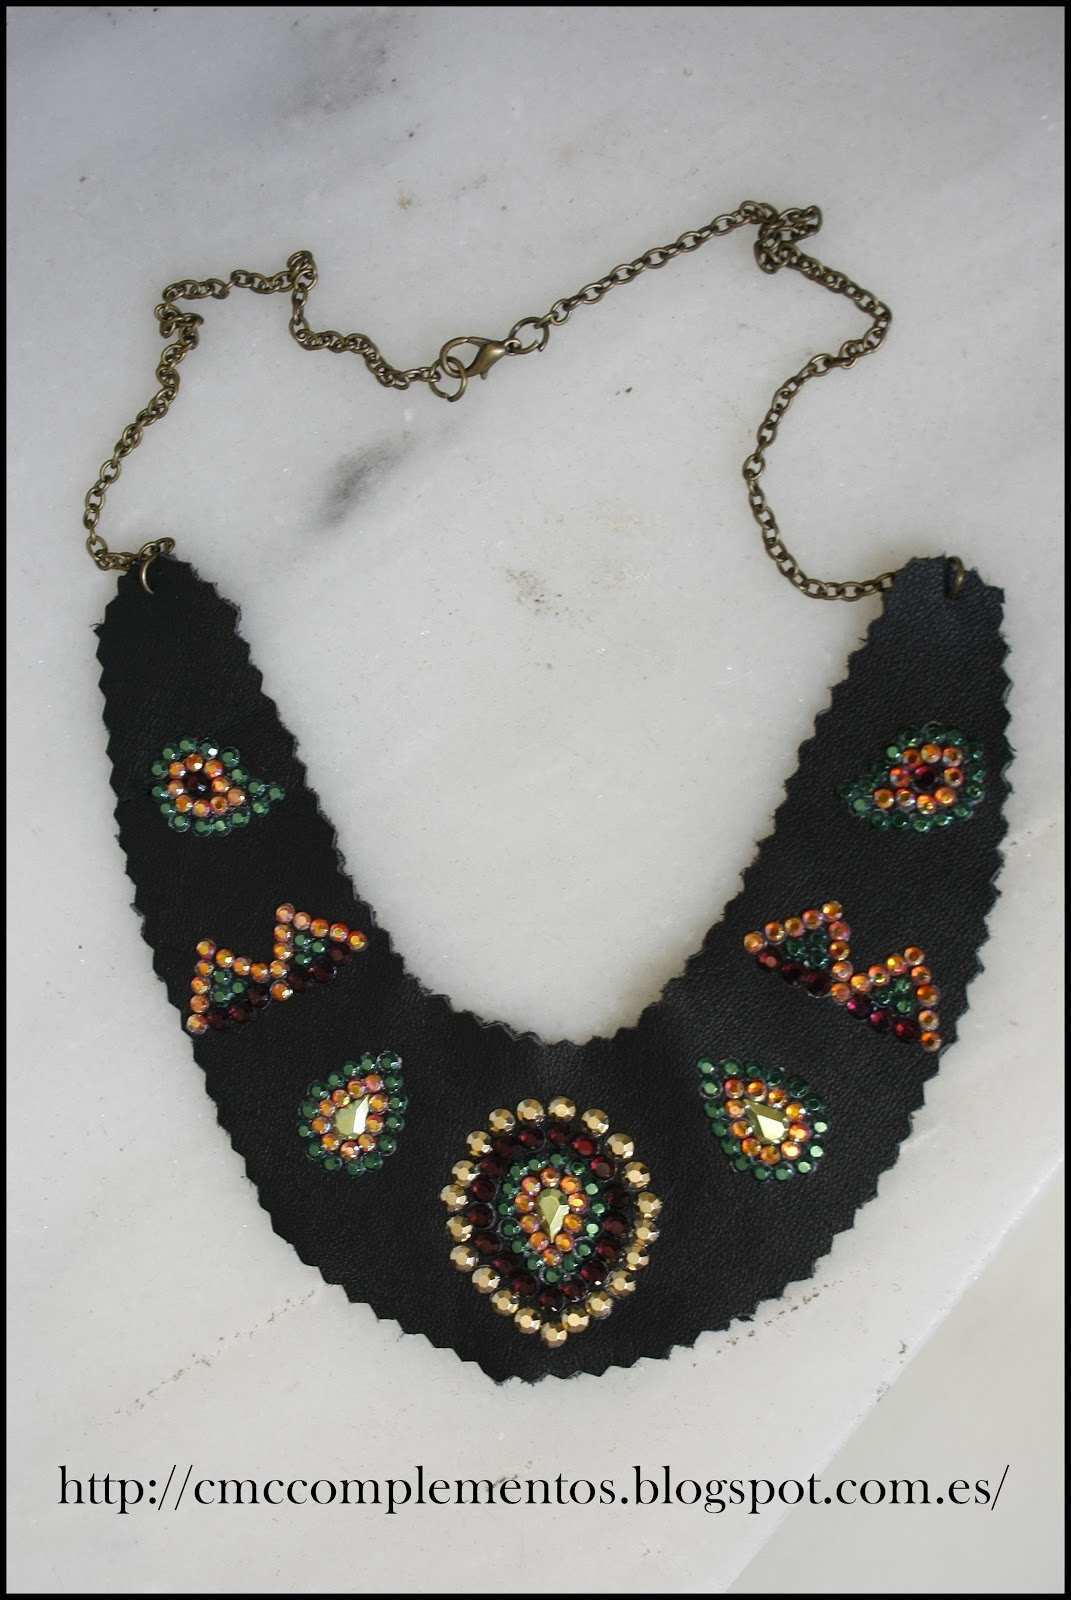 Cmc complementos collares baberos cuero tachas - Collares de cuero ...